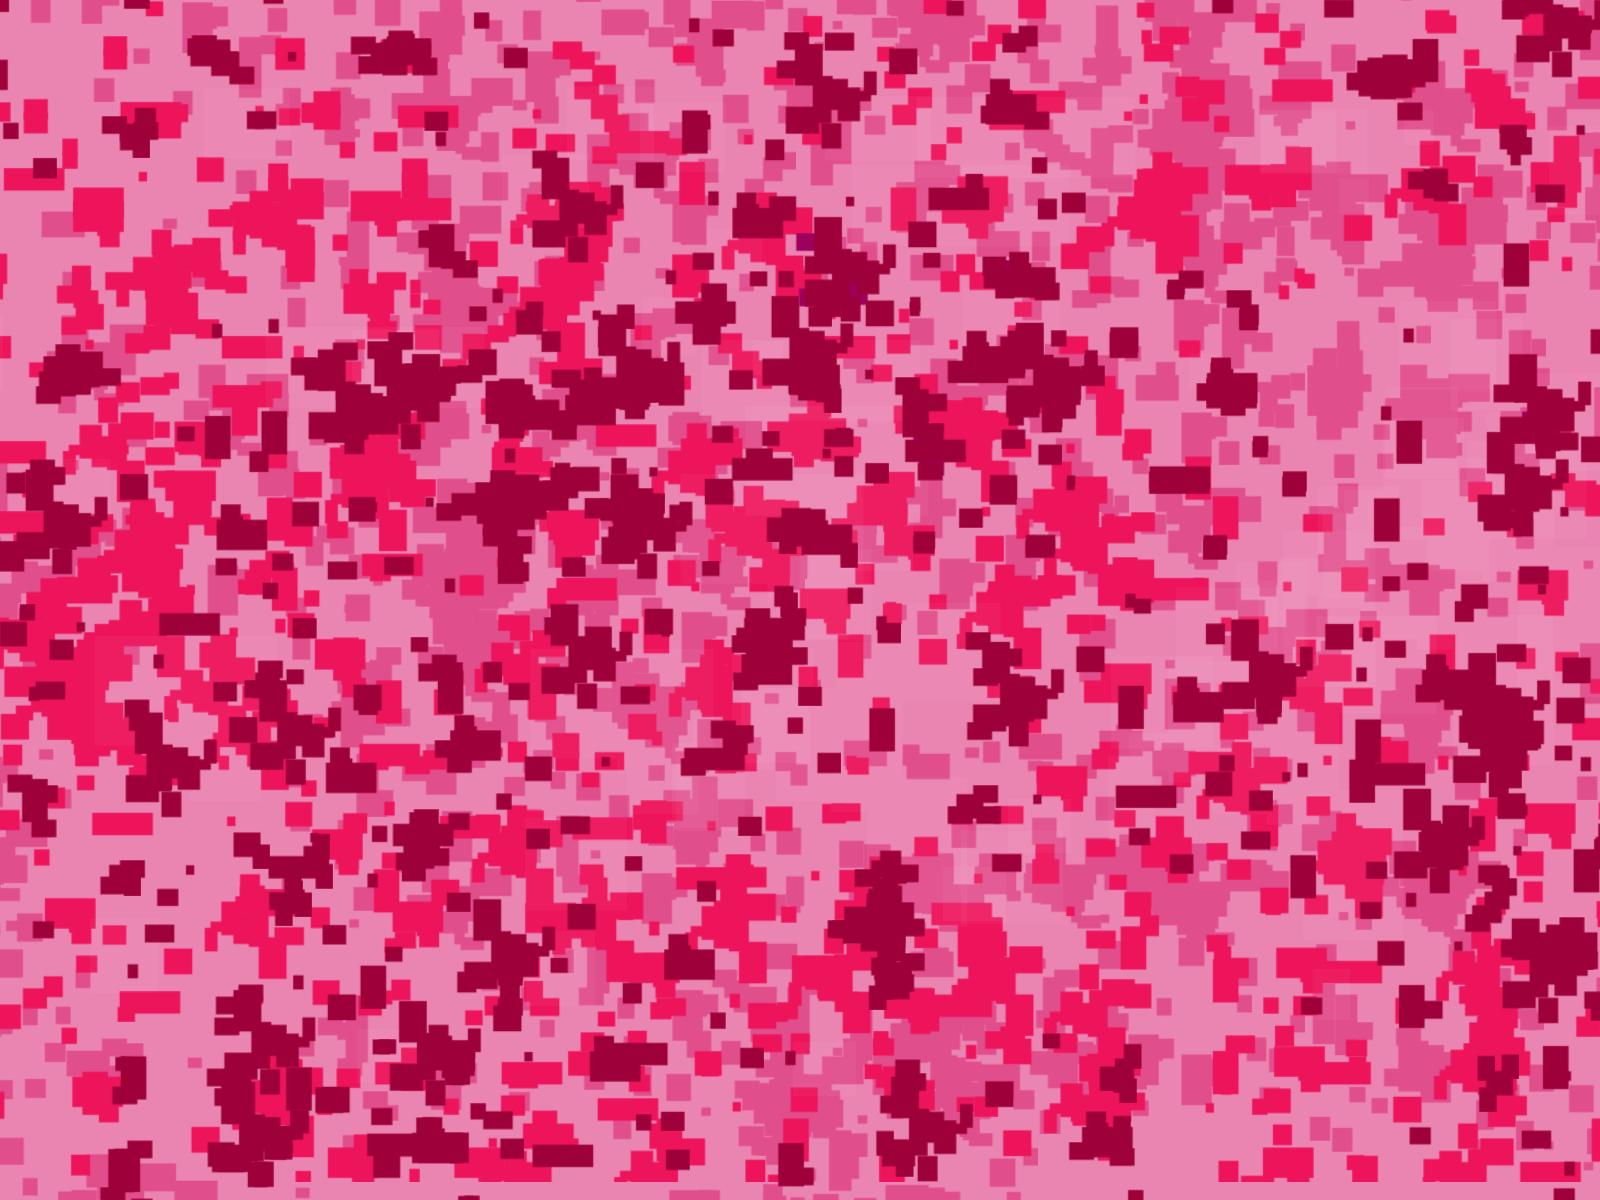 Pink Camo Wallpapers   WallpaperAsk 1600x1200